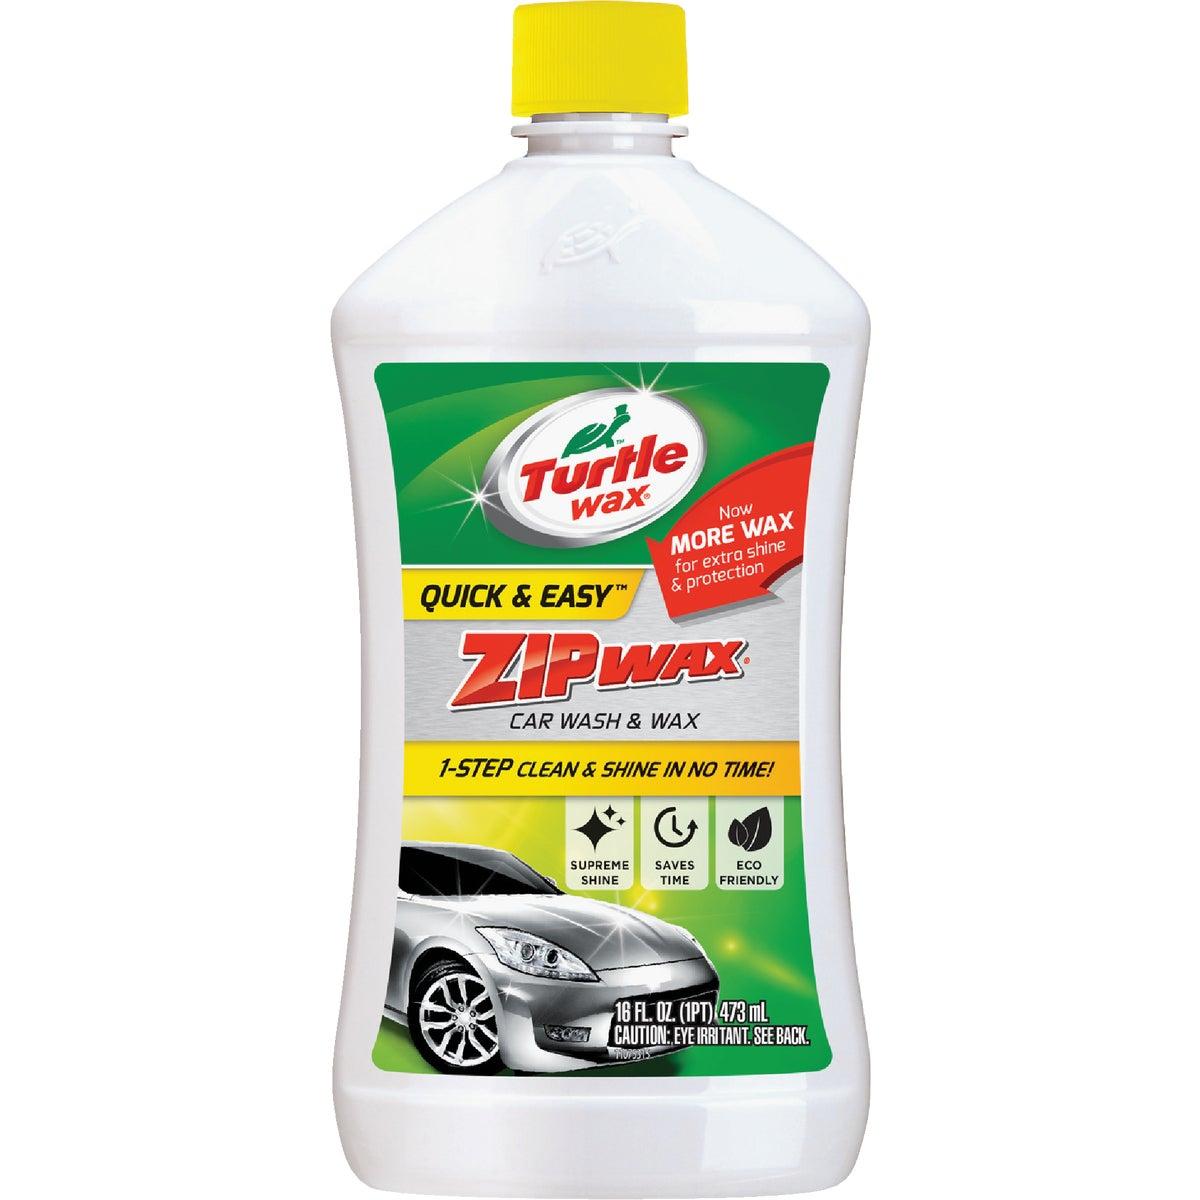 16Oz Liquid Car Wash